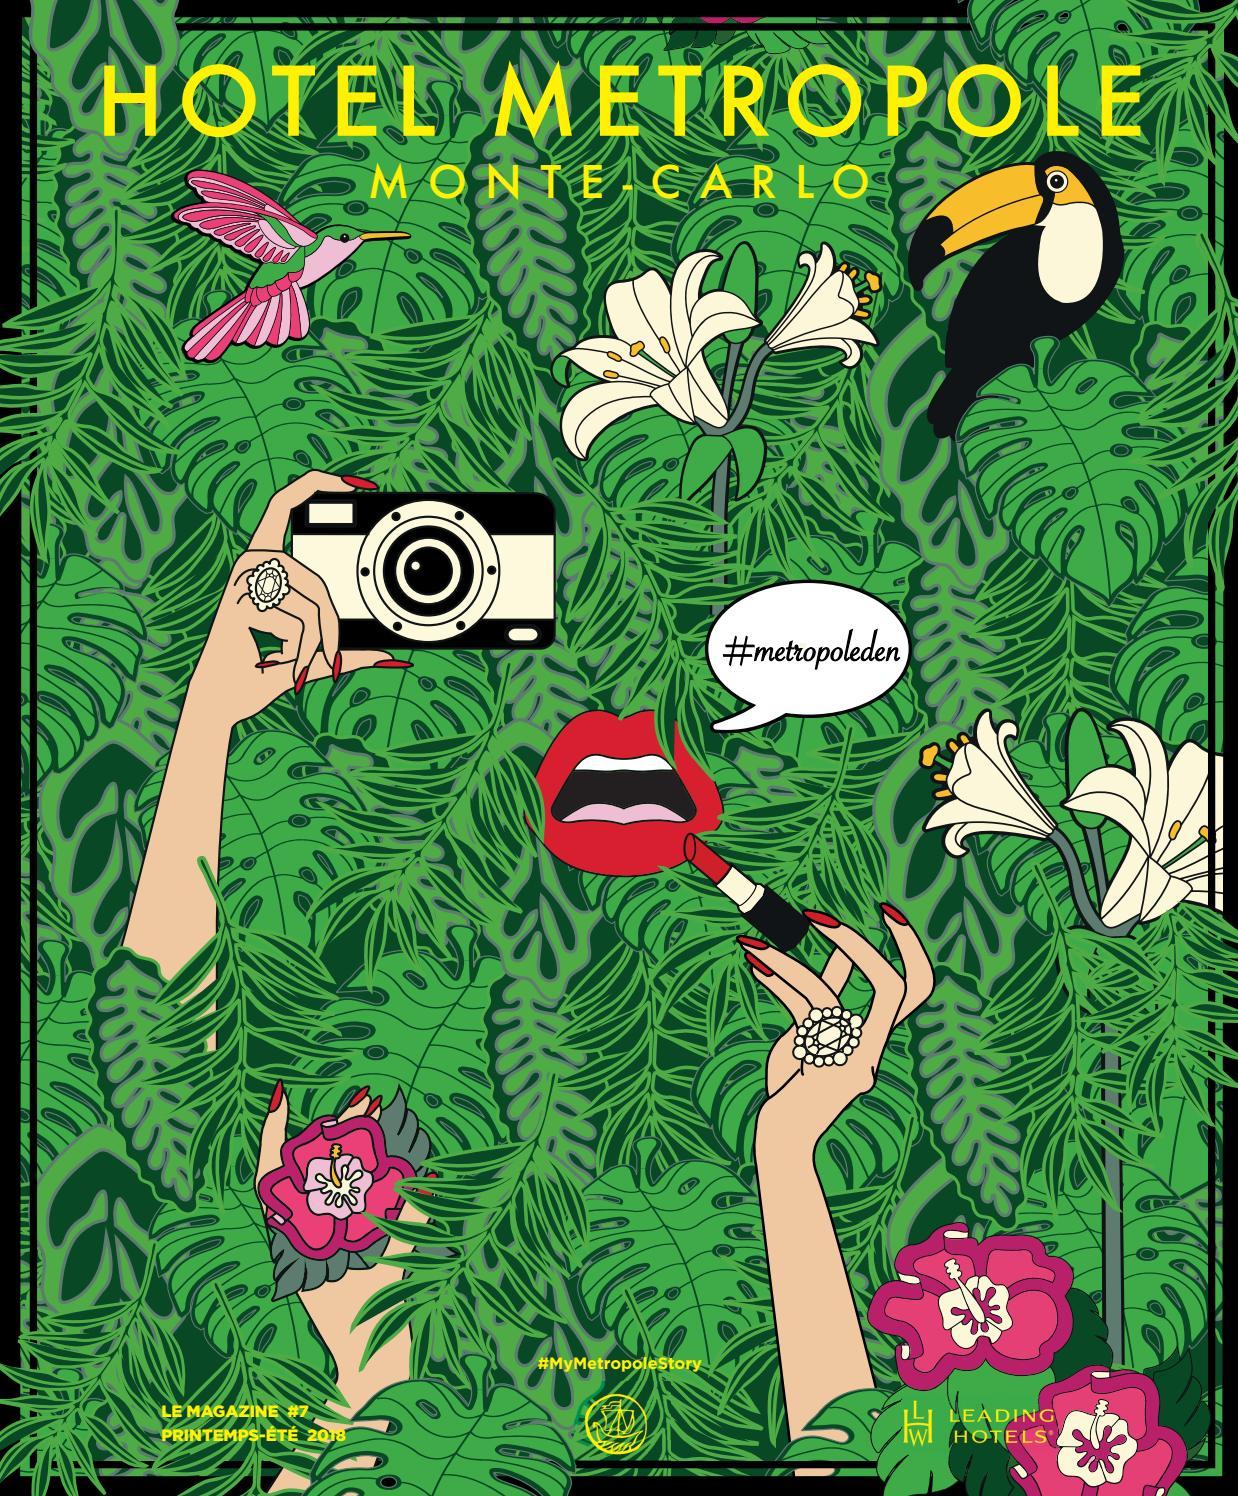 Metropole Mai 2018 by Riviera Magazine - issuu f785597dfae